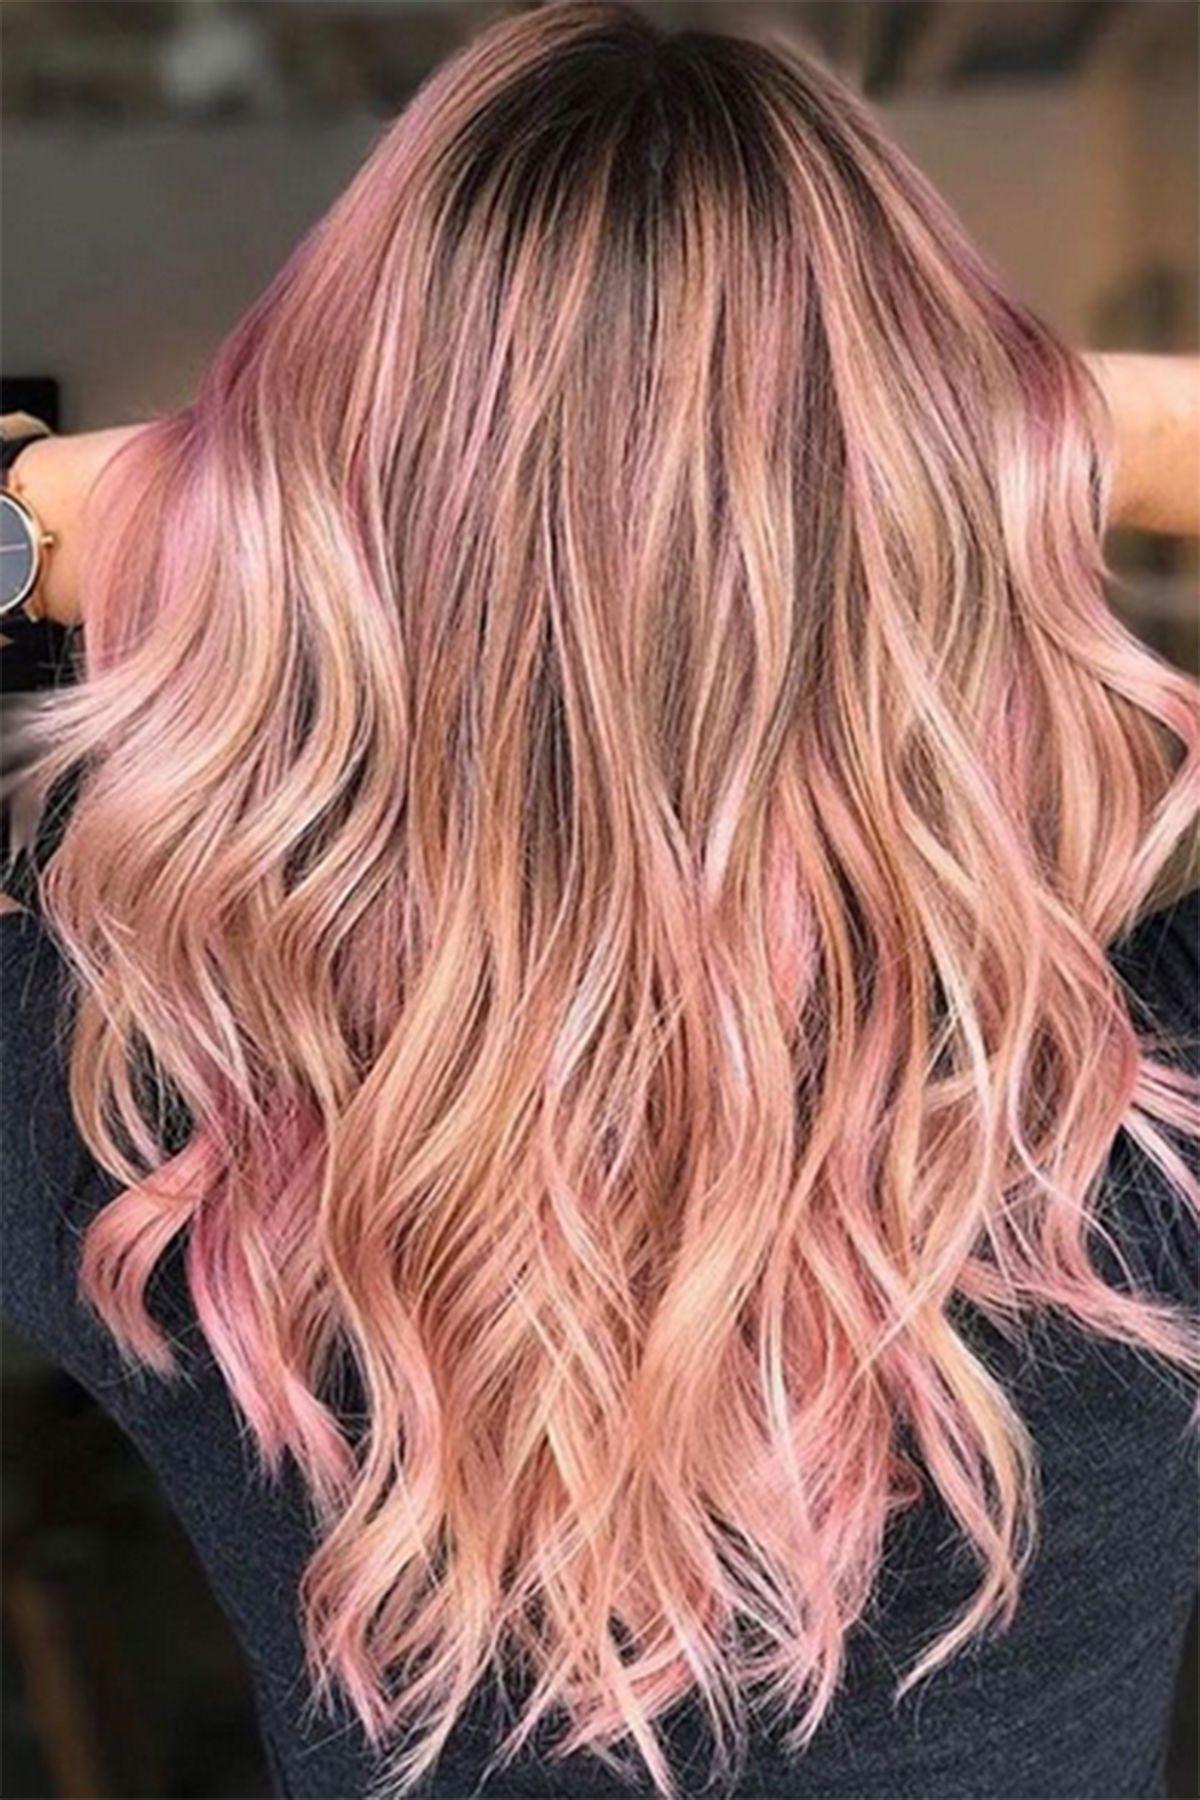 Trend Haarfarbe Soft Rosé Gold Hair In 2019 Hair Color